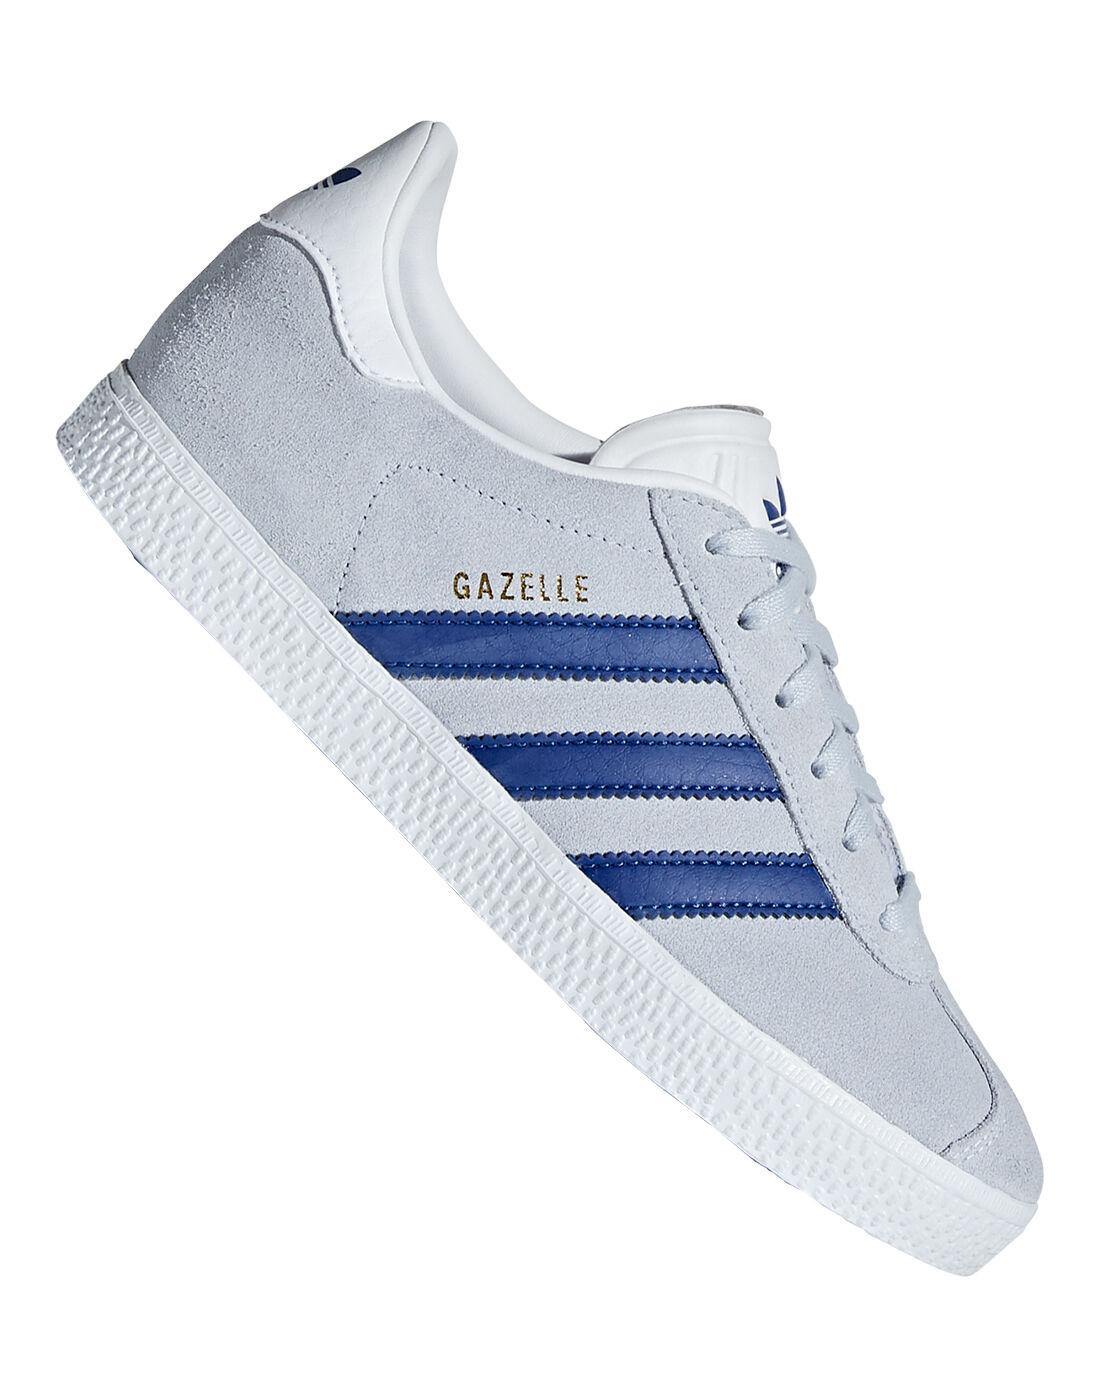 Kid's Grey & Blue adidas Gazelle   Life Style Sports